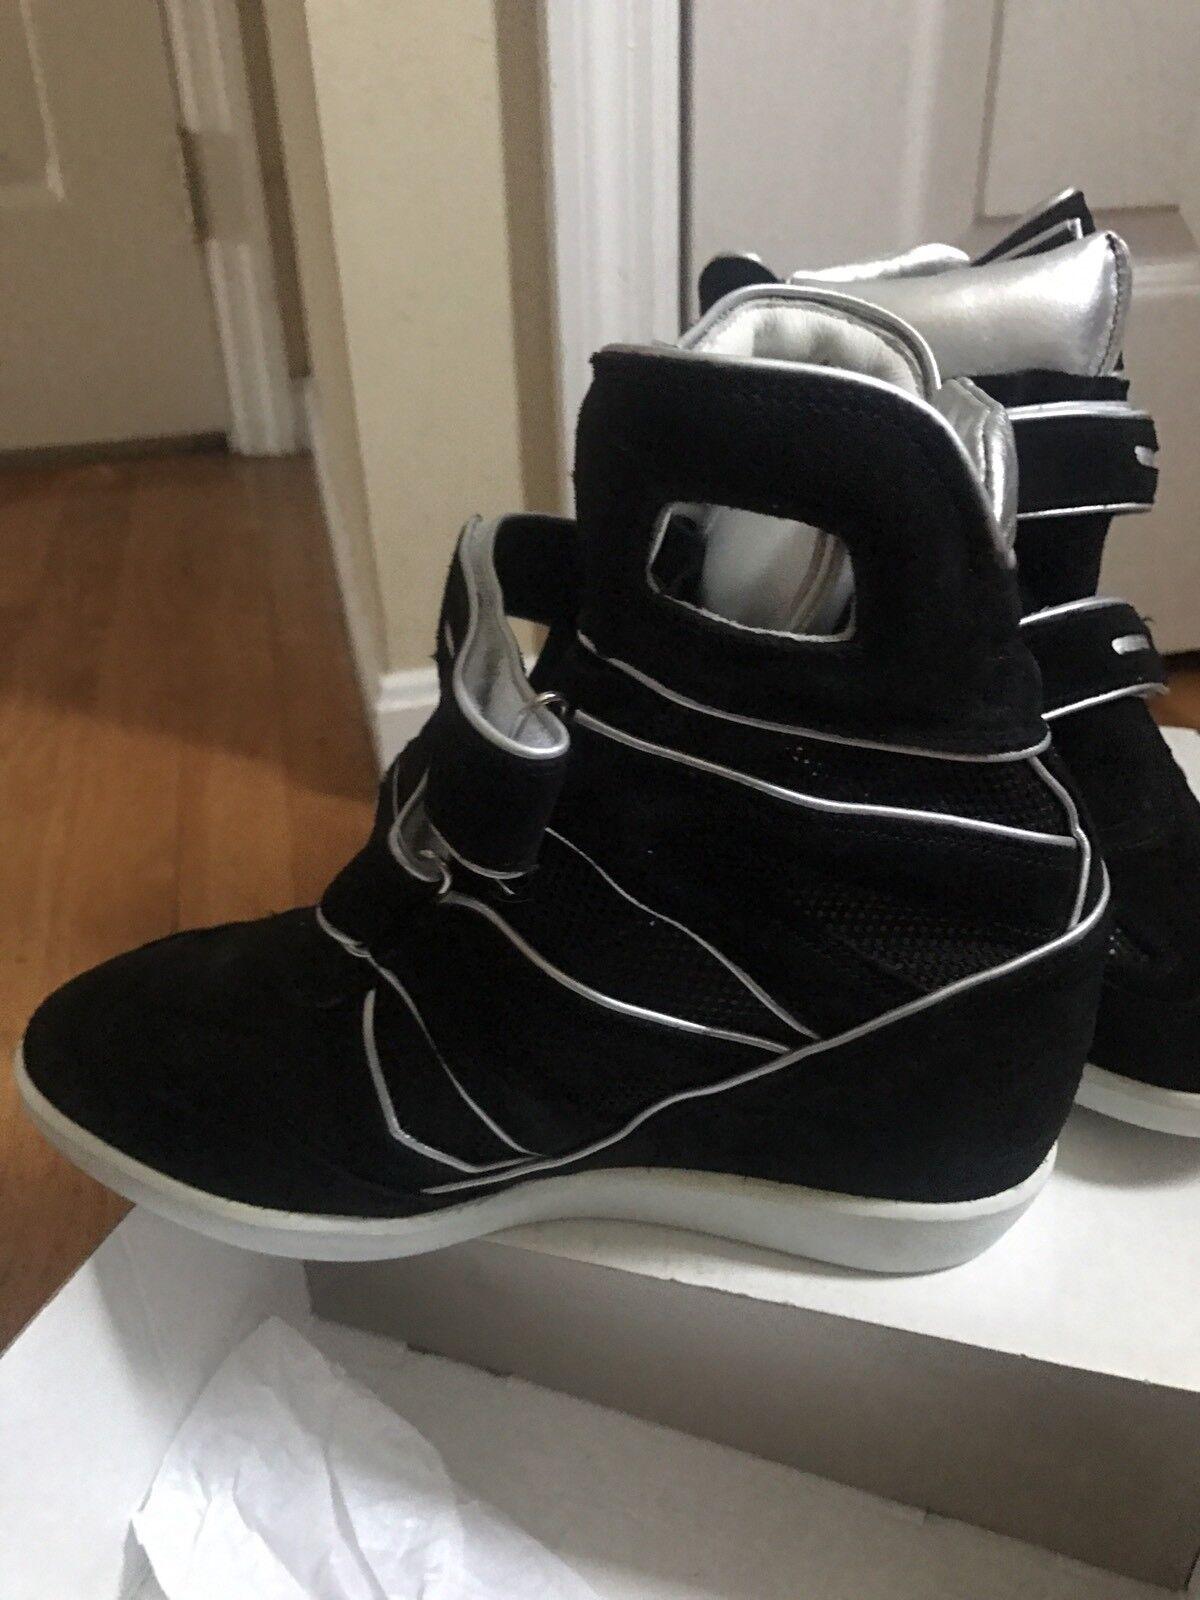 Laboratorio Corte black Pointu Baskets Véritable Daim  maille Sz 10